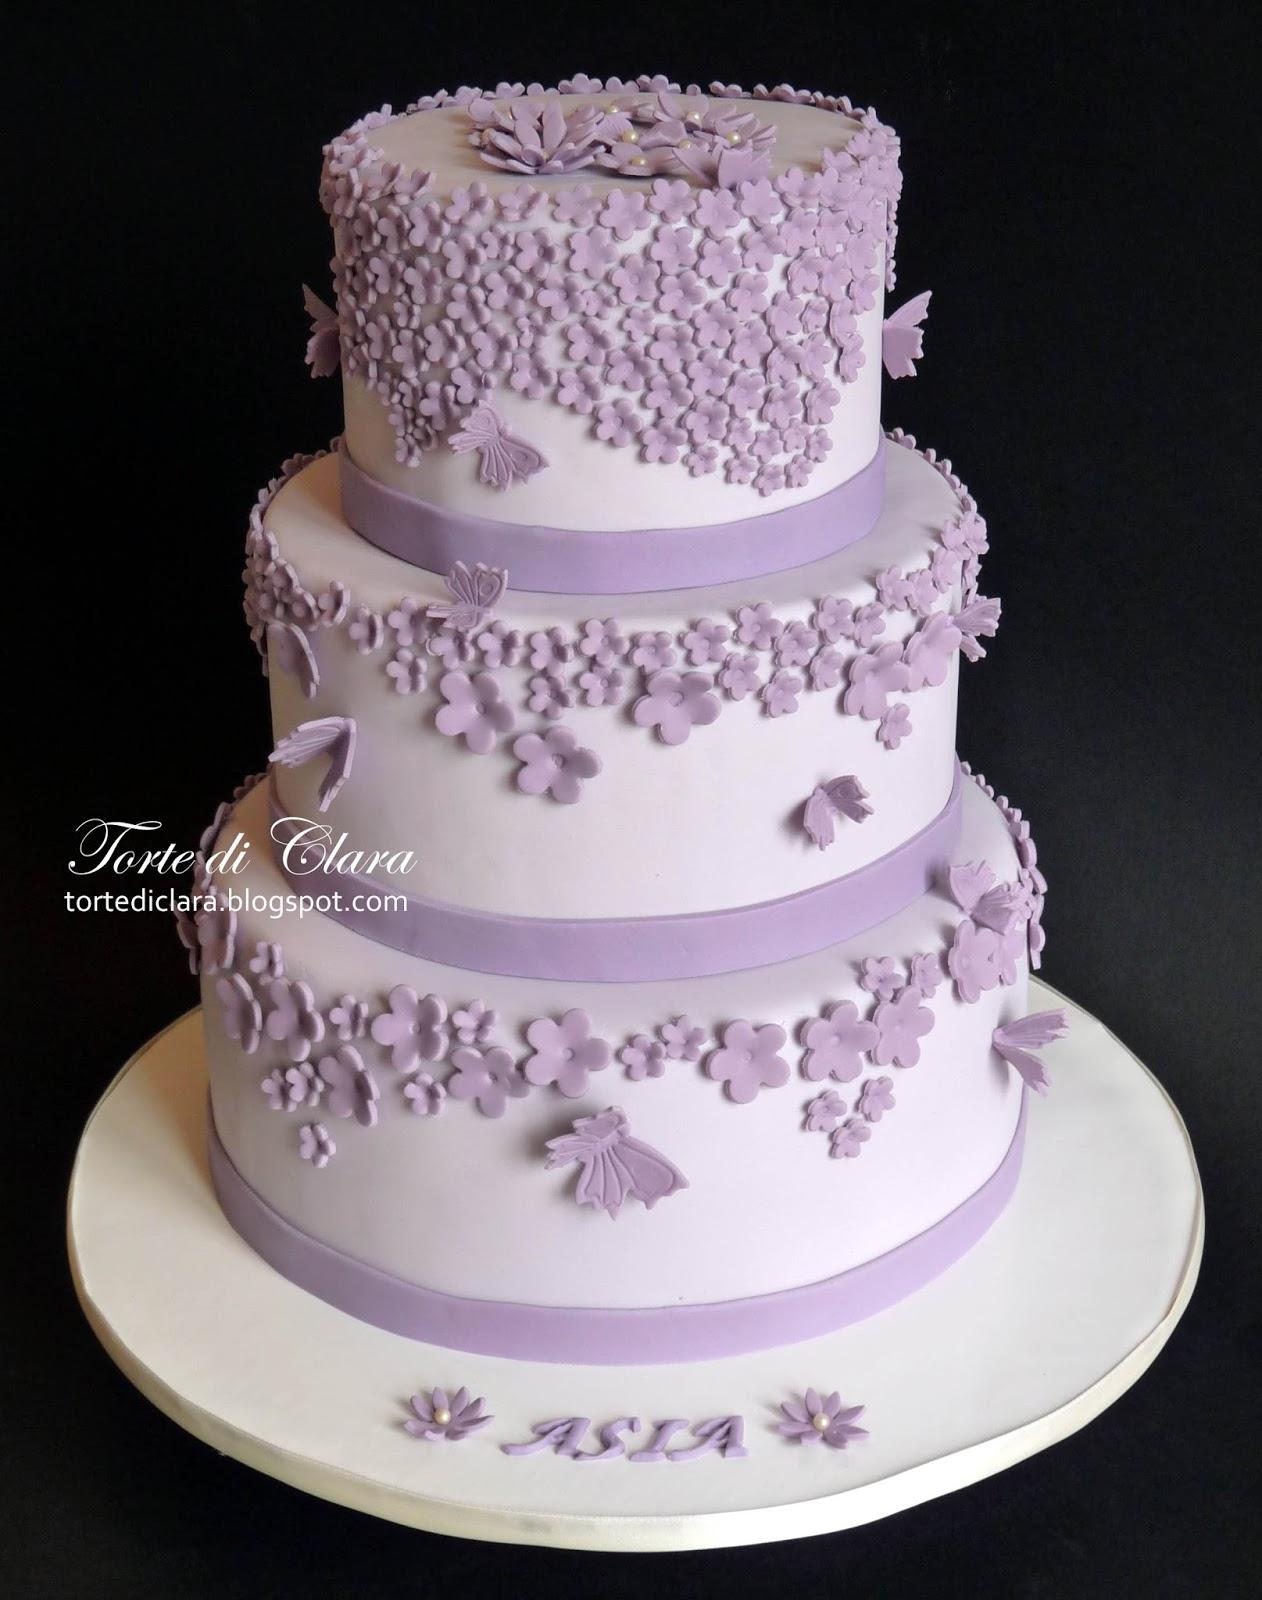 Famoso Torte di Clara: Torta Cresima (2) KN58